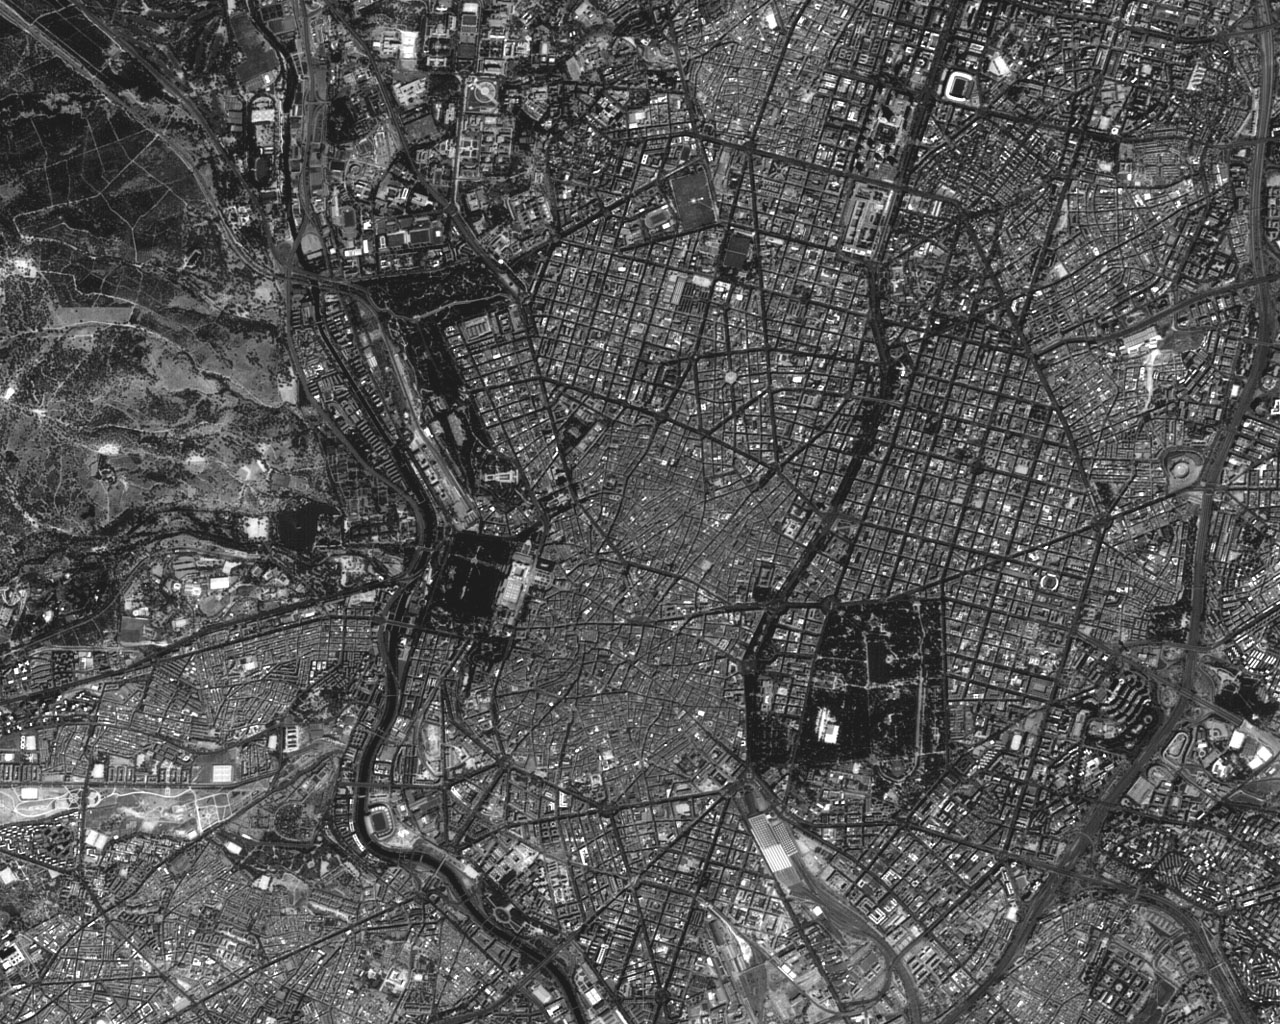 Imagen satelital del centro de Madrid 2001